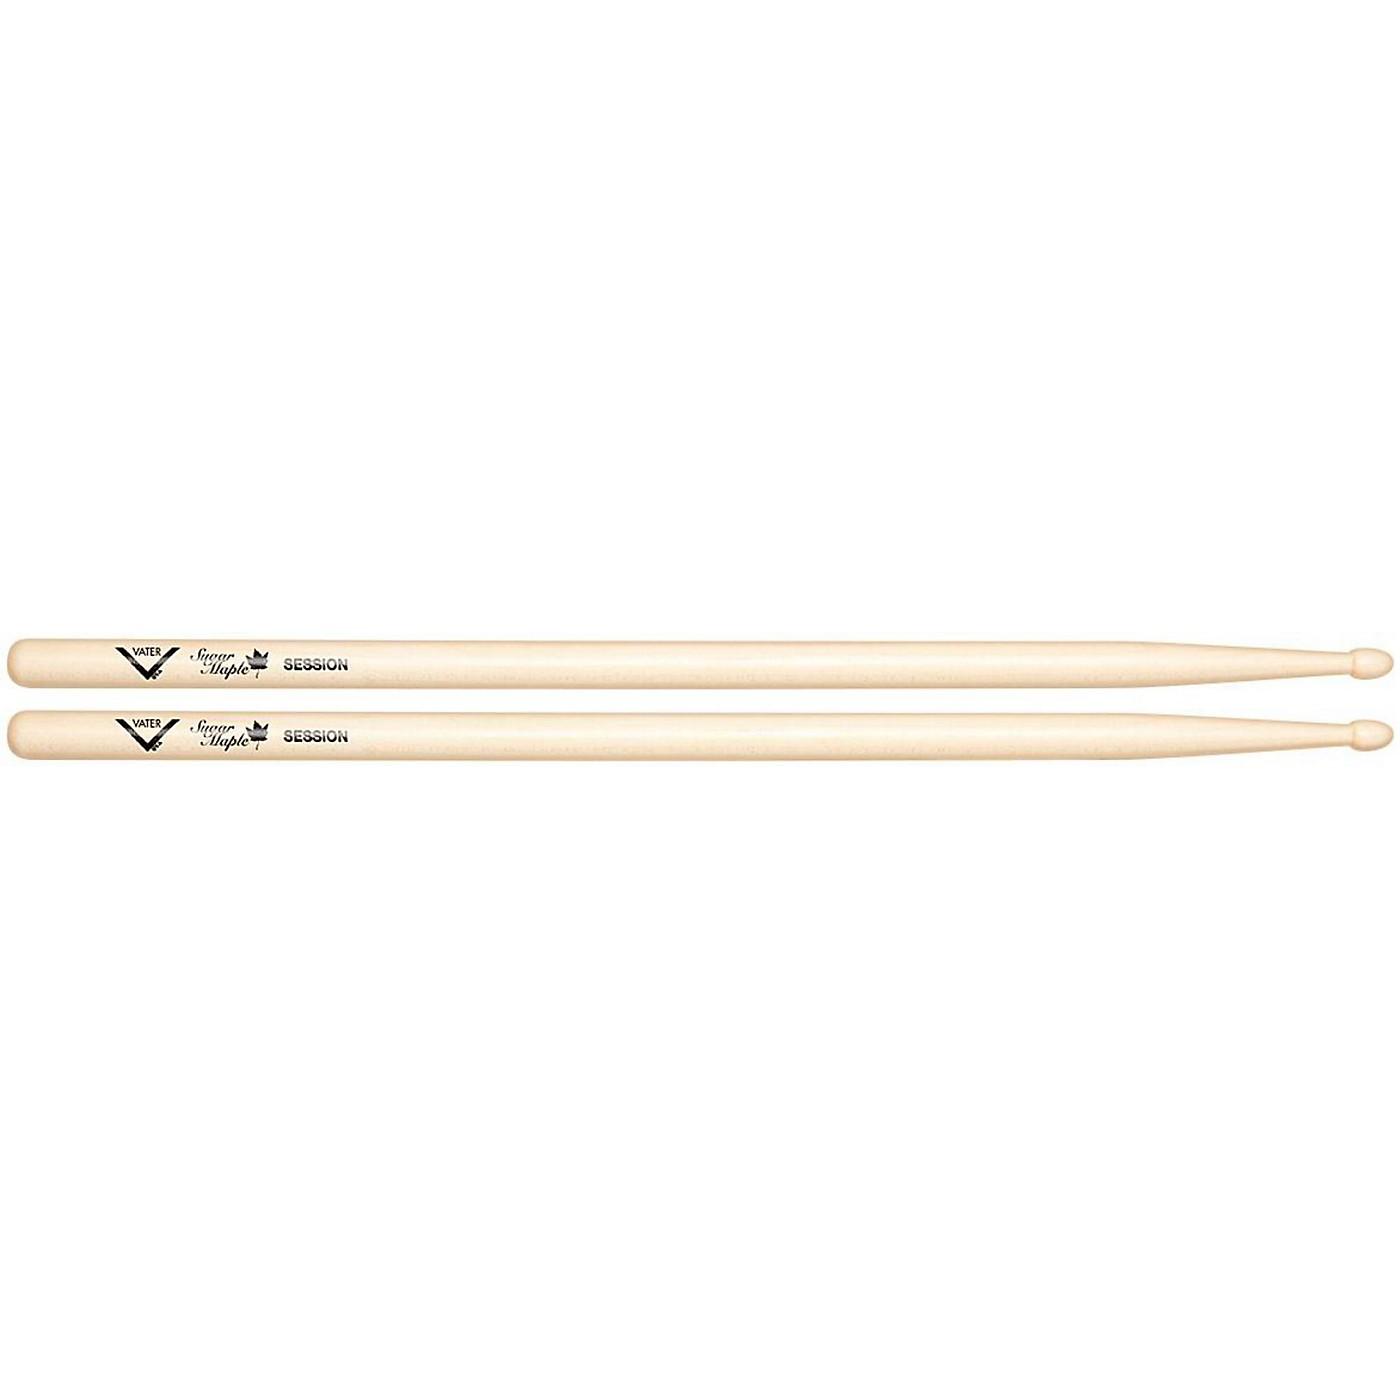 Vater Sugar Maple Drum Stick Session thumbnail